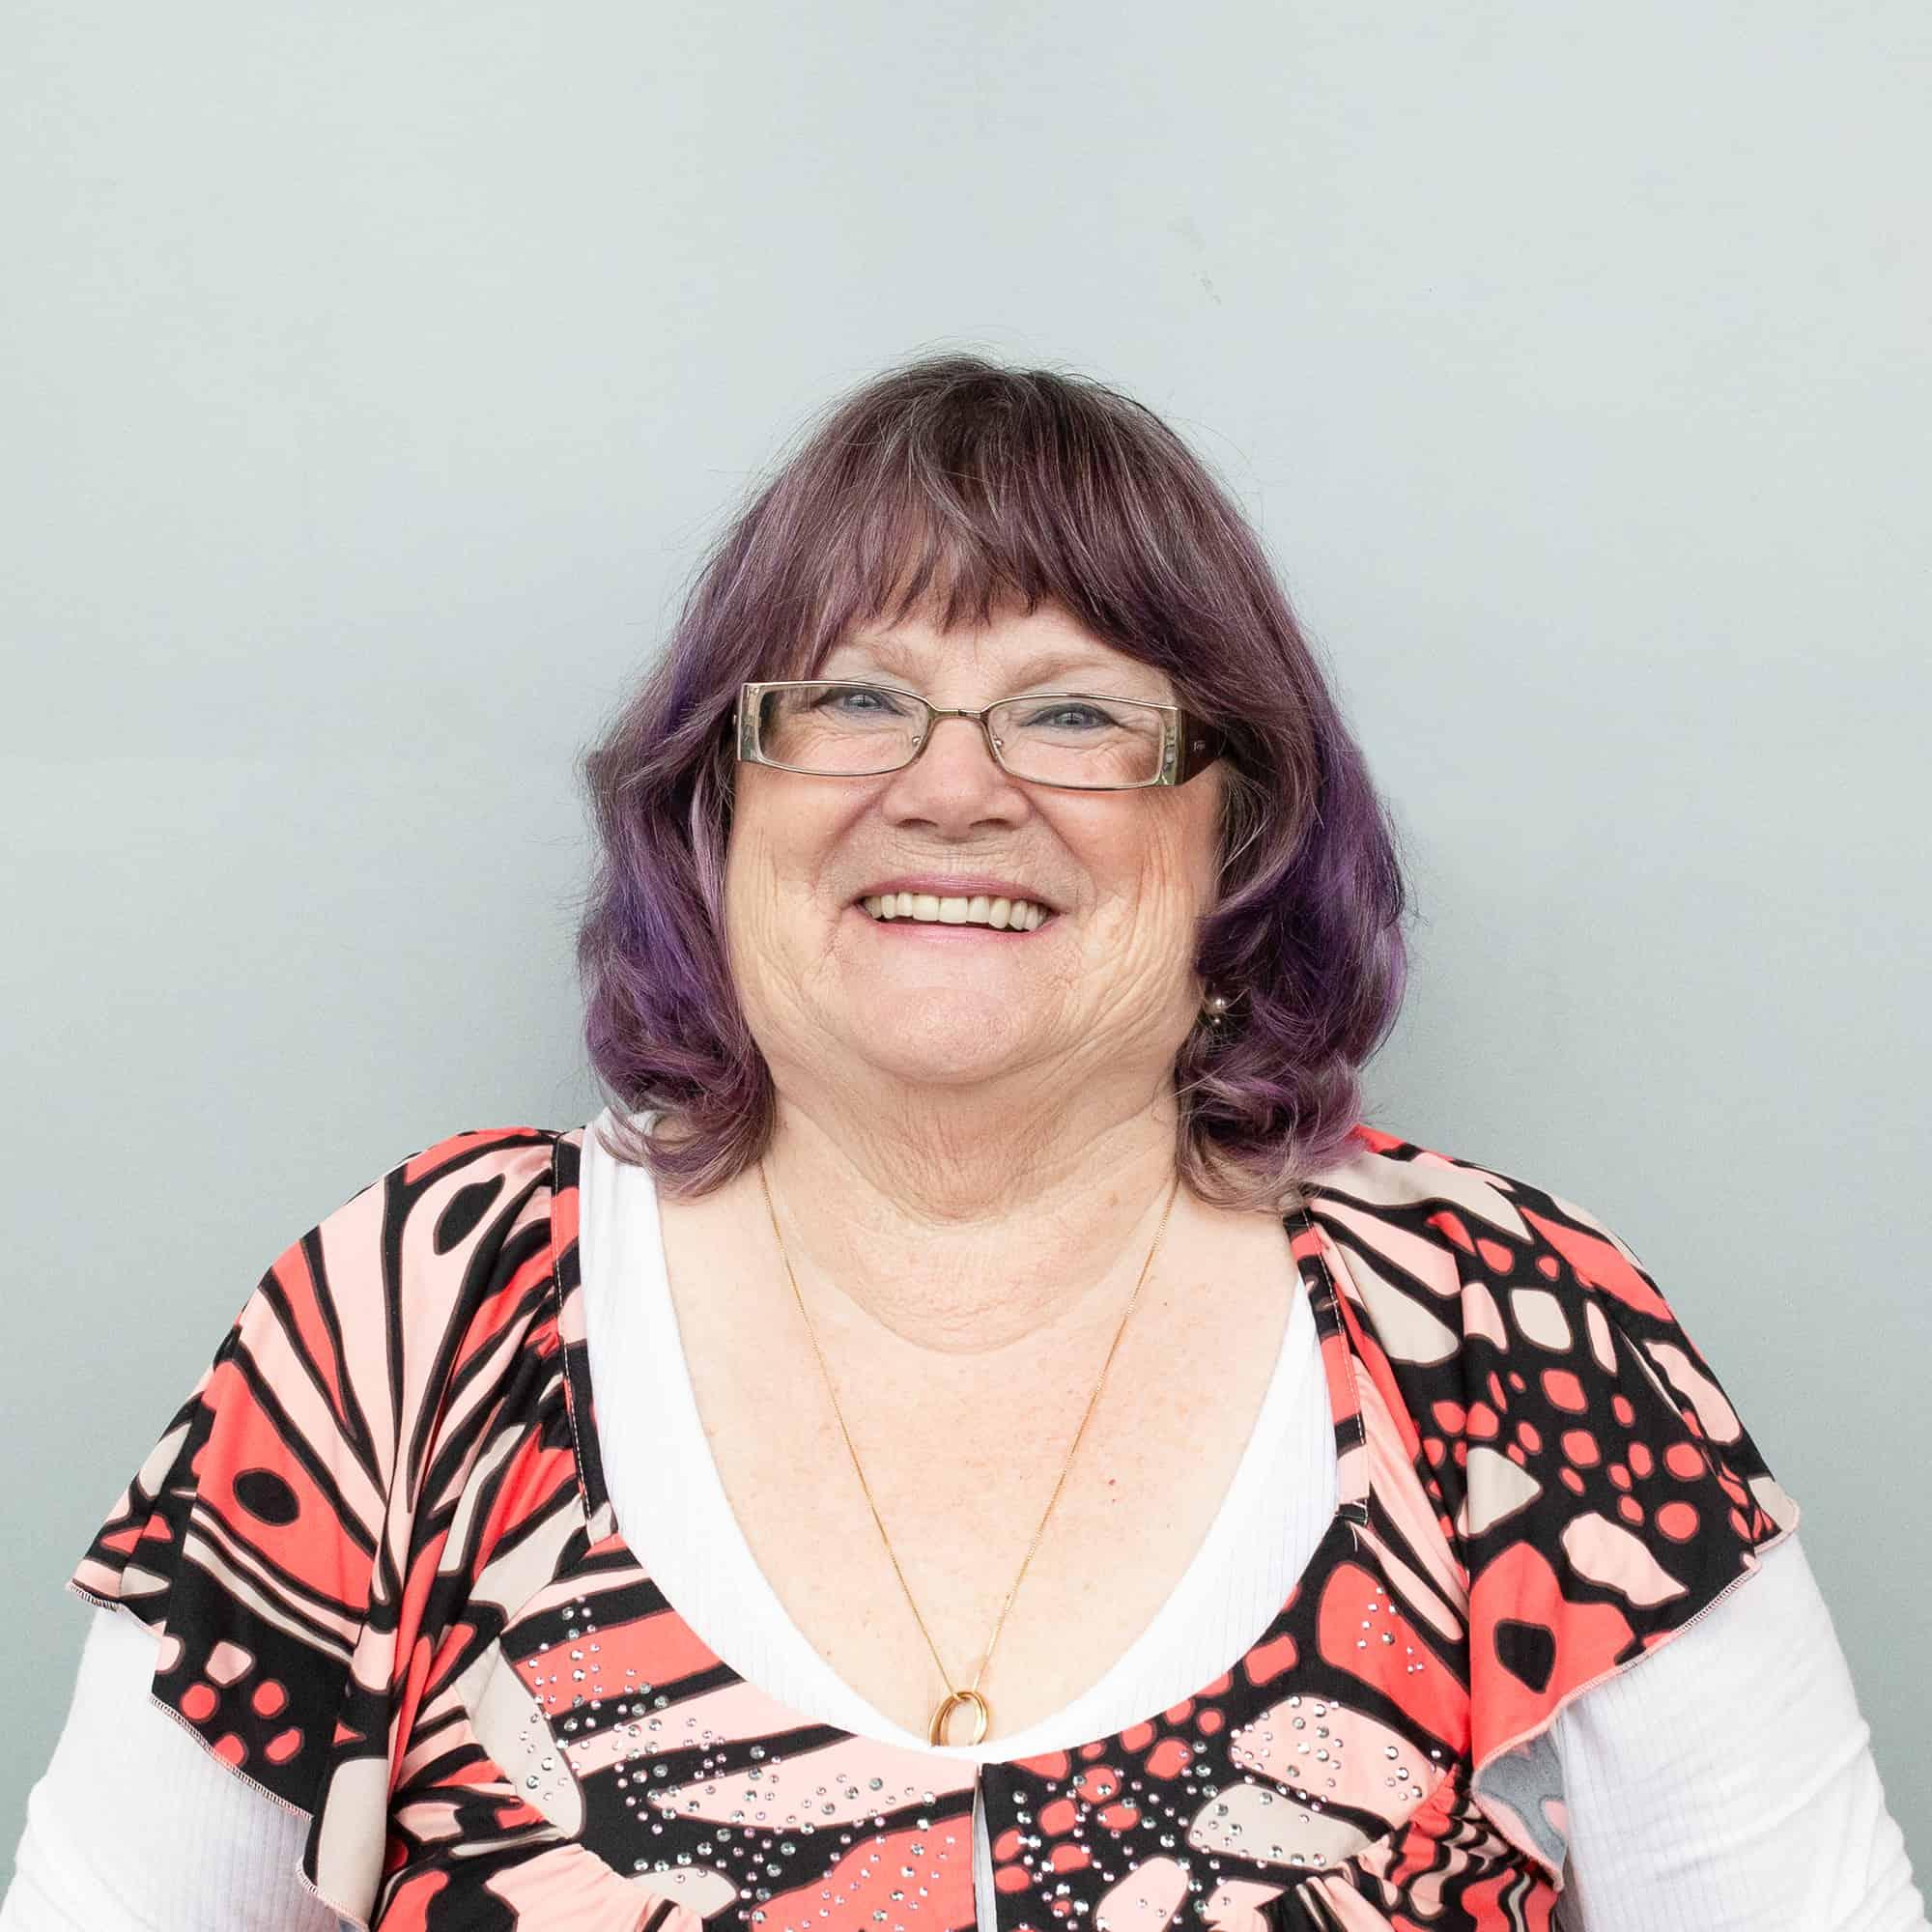 About - The Transverse Myelitis Association